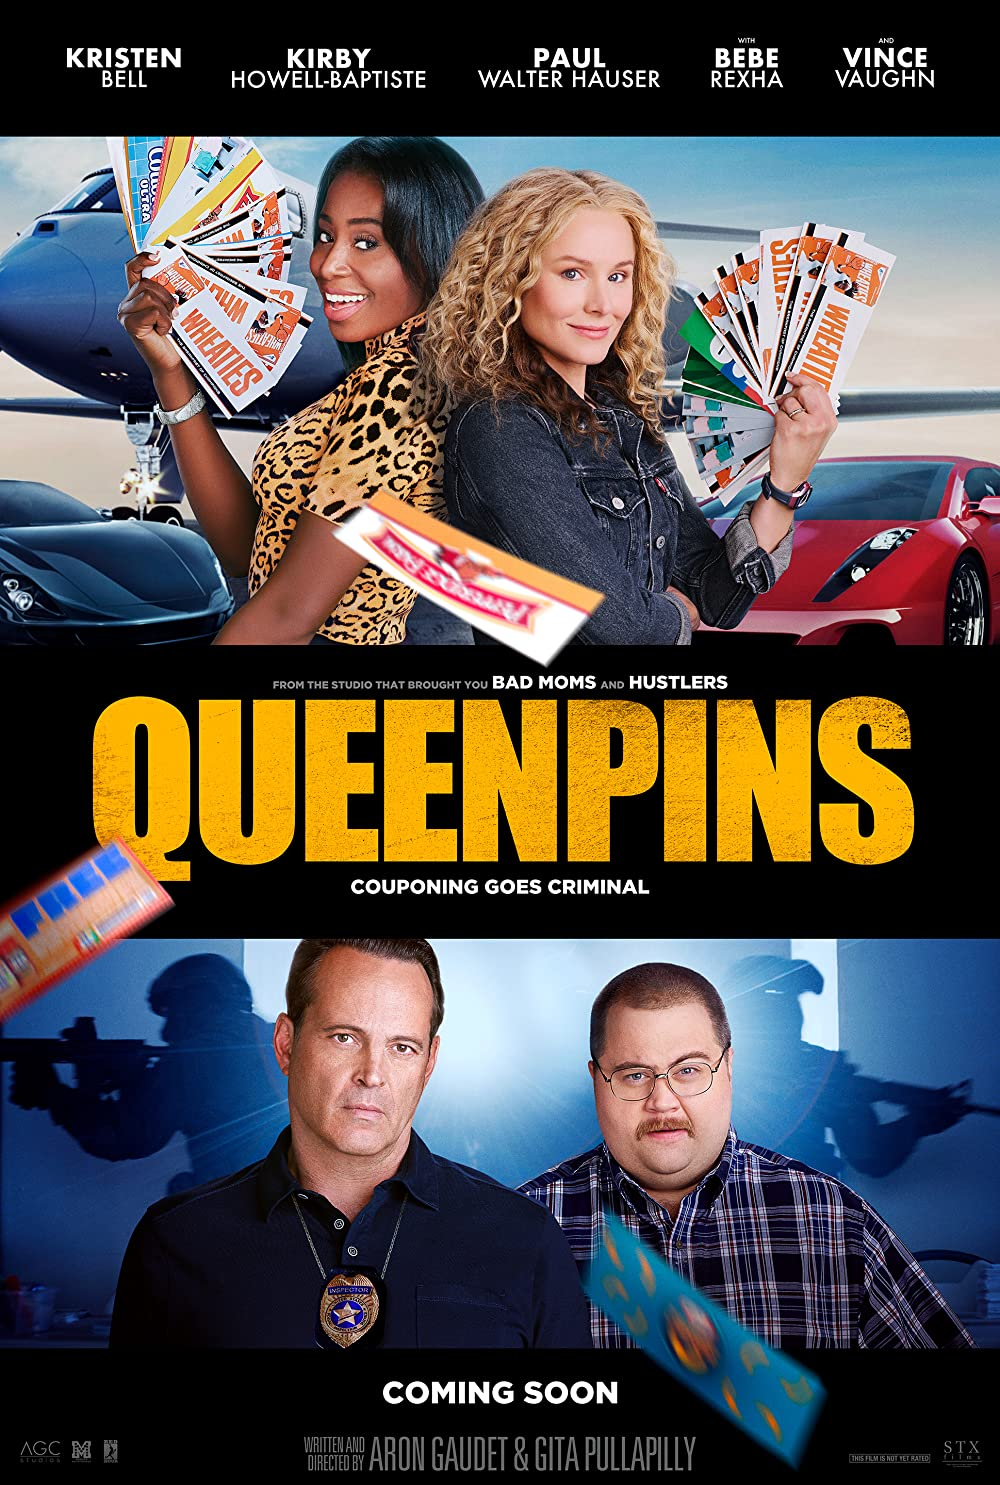 Download Queenpins (2021) Telugu Dubbed (Voice Over) & English [Dual Audio] WebRip 720p [1XBET] FREE on 1XCinema.com & KatMovieHD.sk